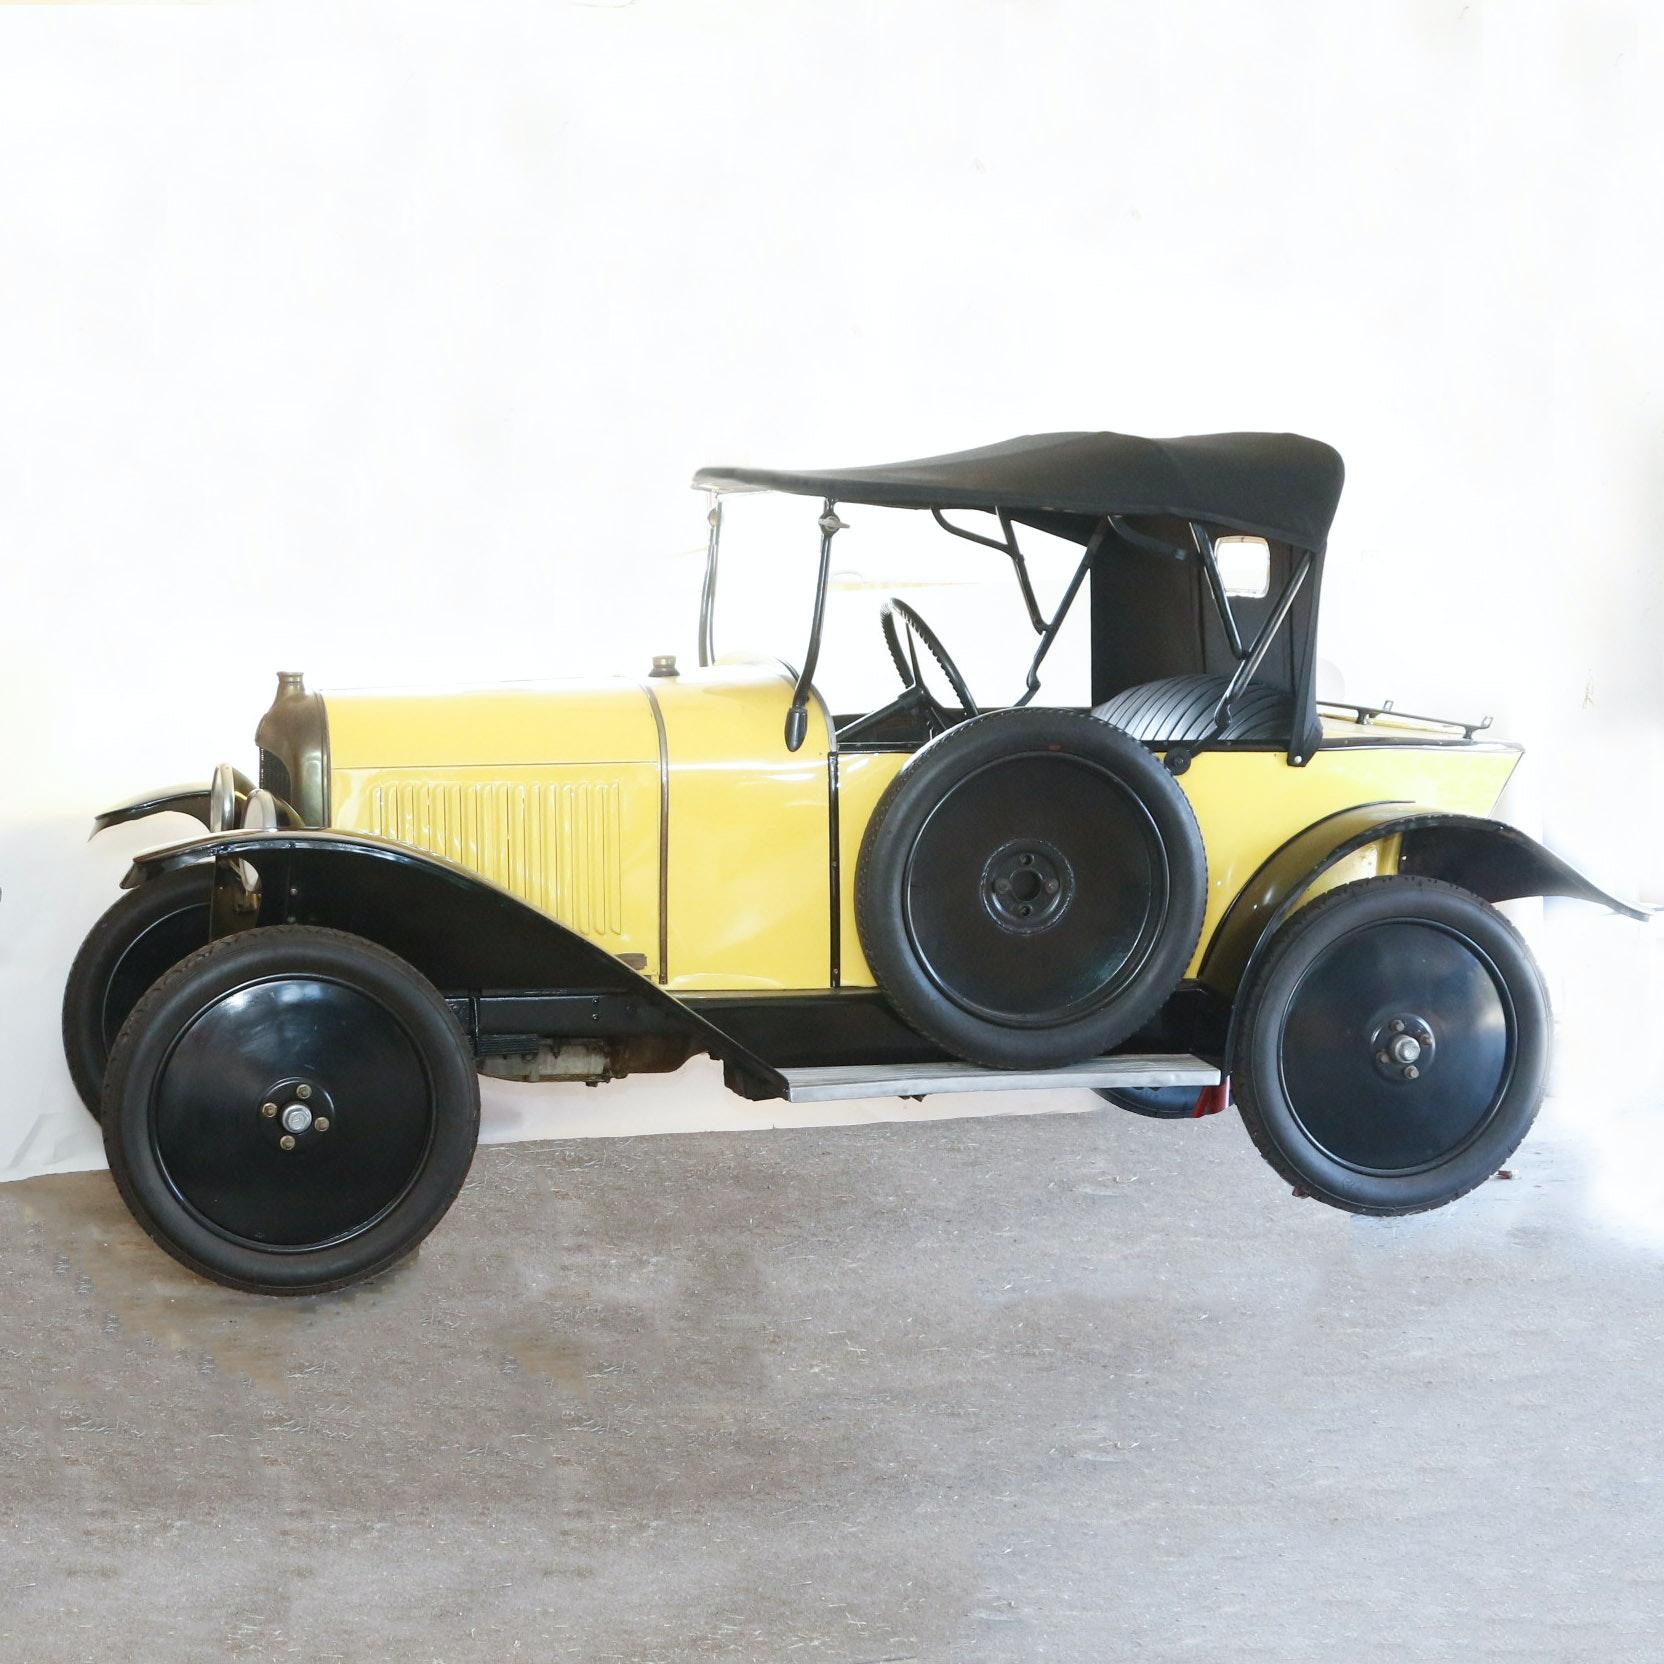 1922 Citroën 5-CV Torpedo Cabriolet